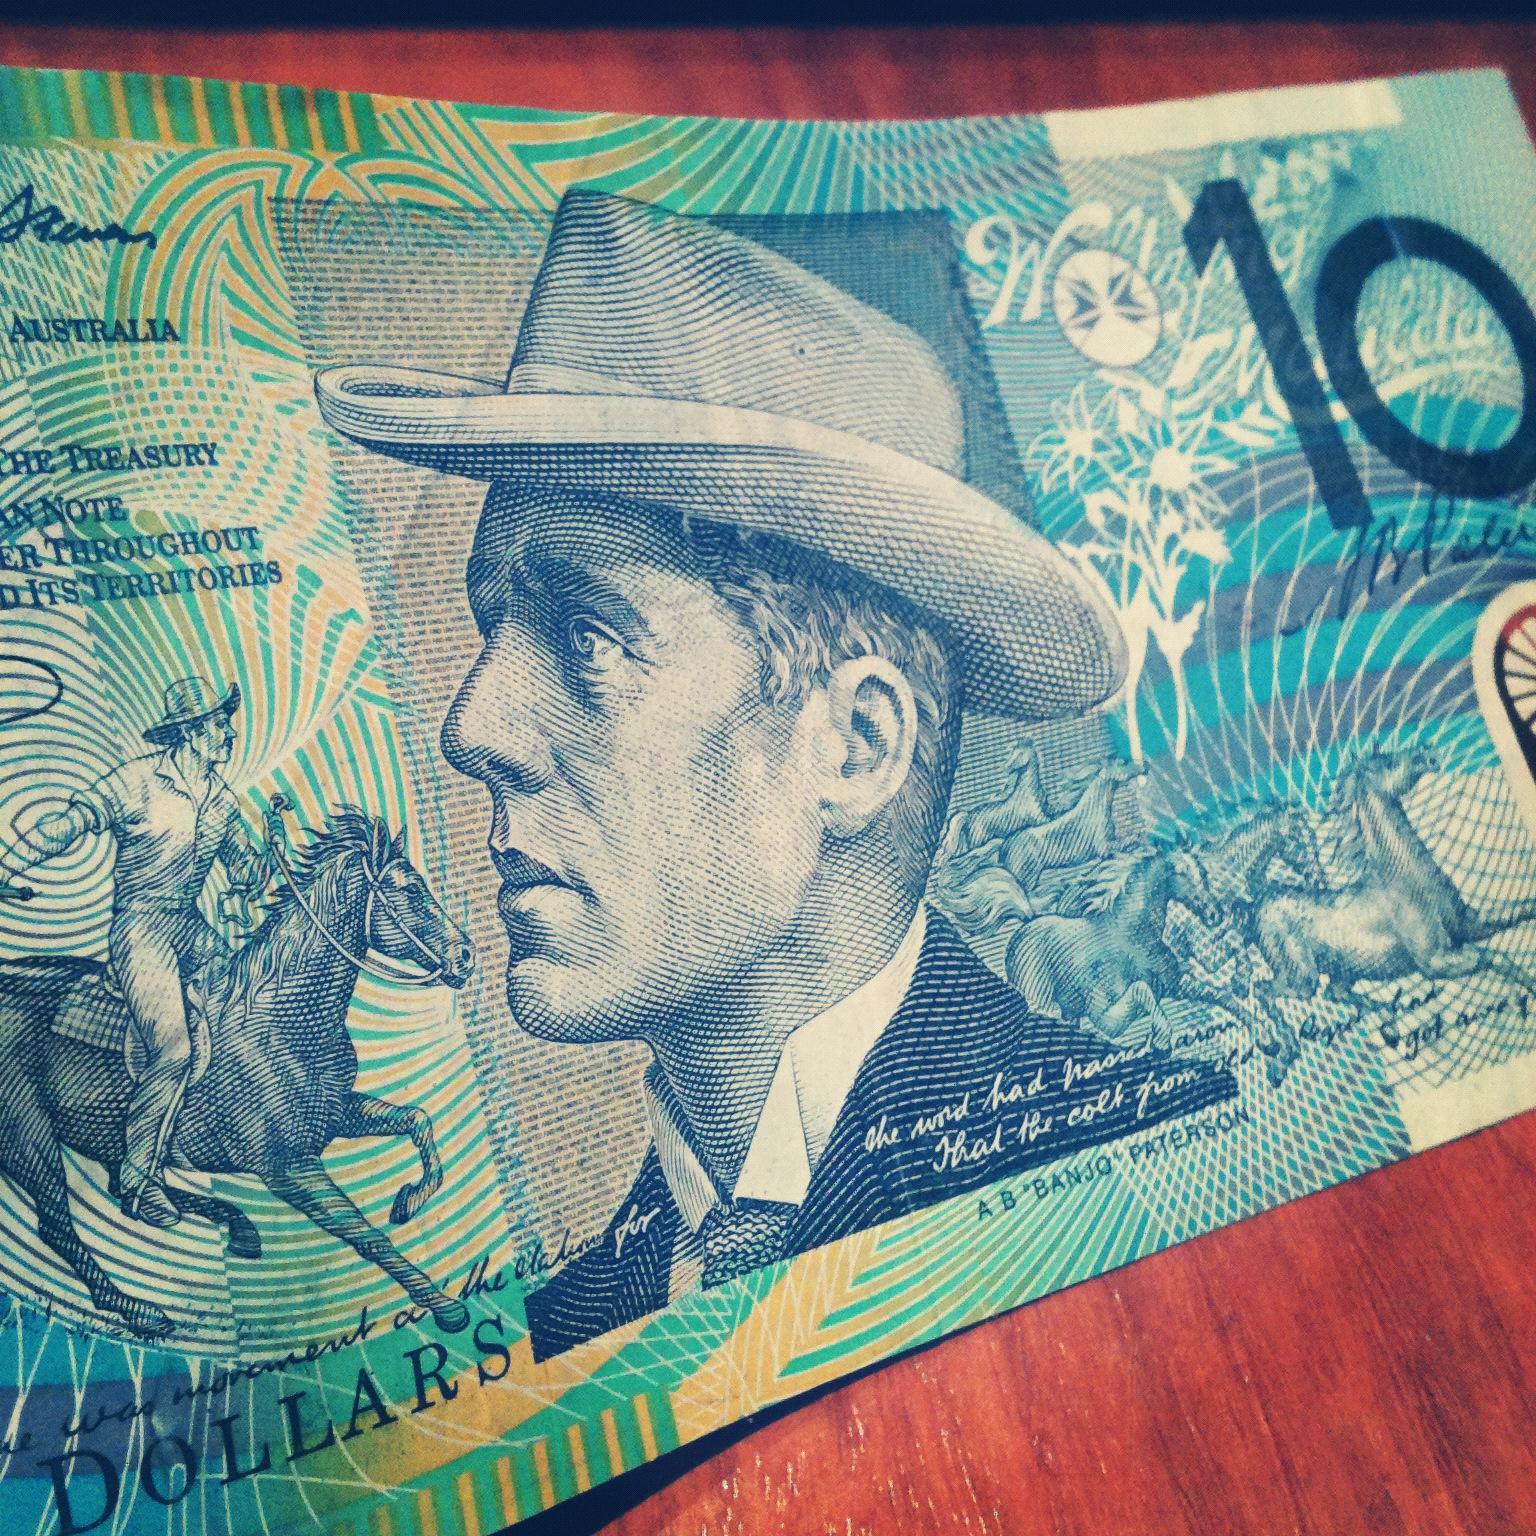 Show me the money! Photo credit: Natalie Sambhi